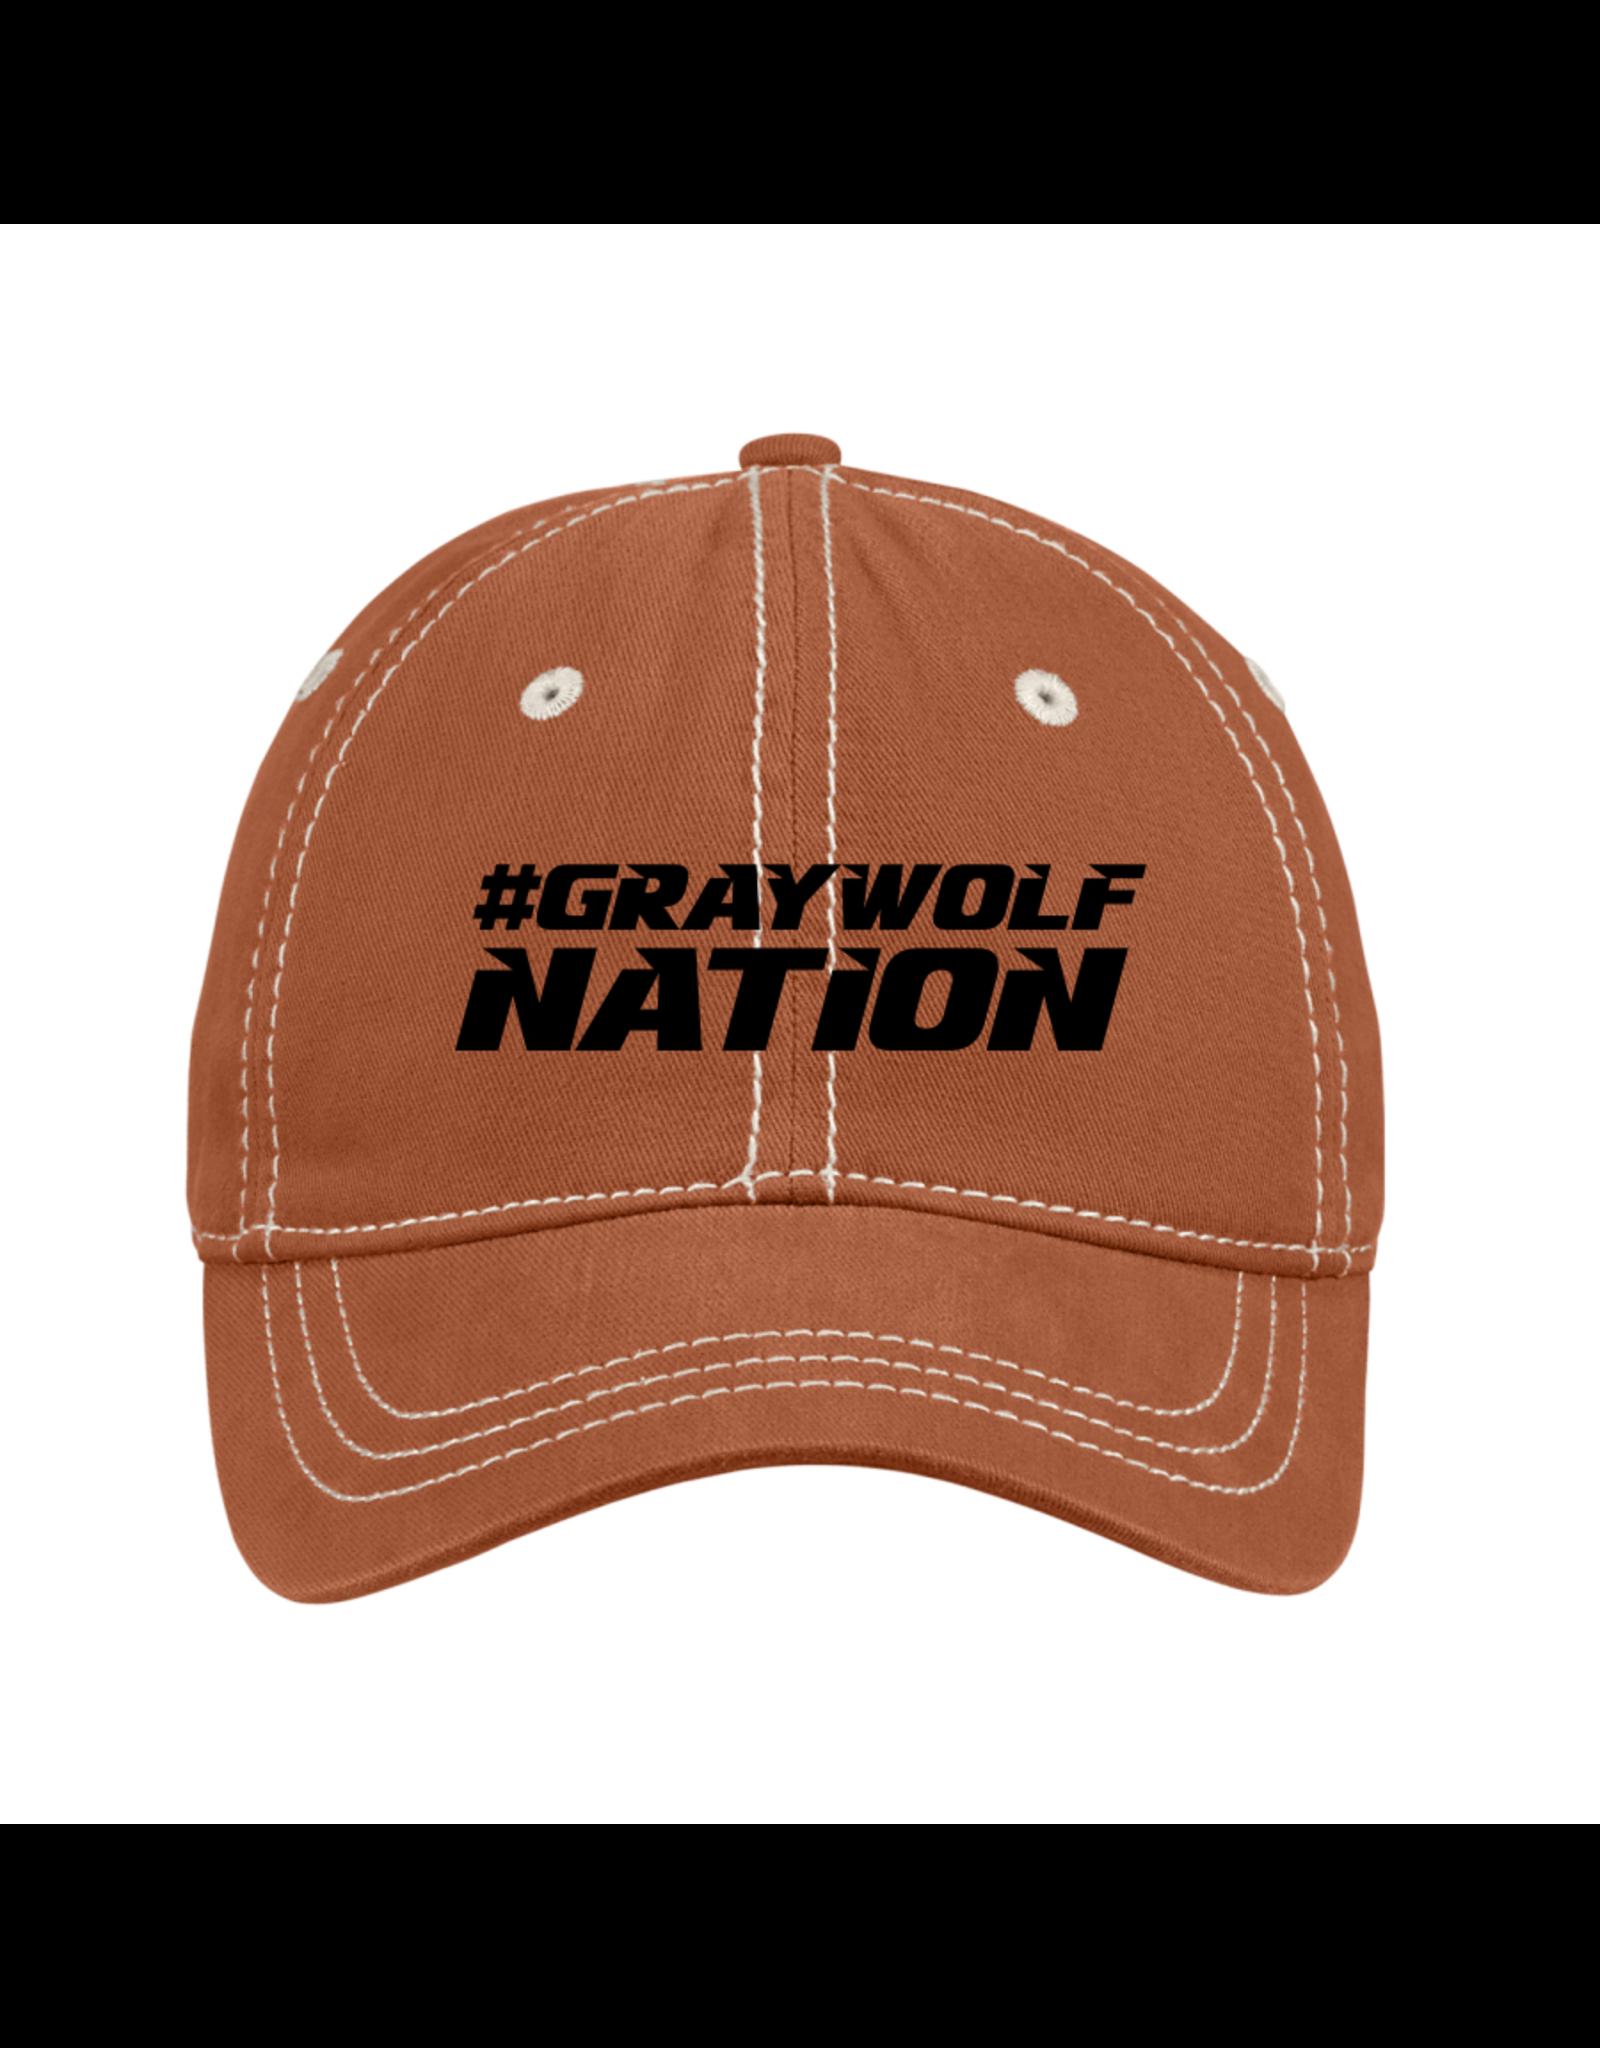 District District®Thick Stitch Cap | #GraywolfNation - Orange with Black Imprint *